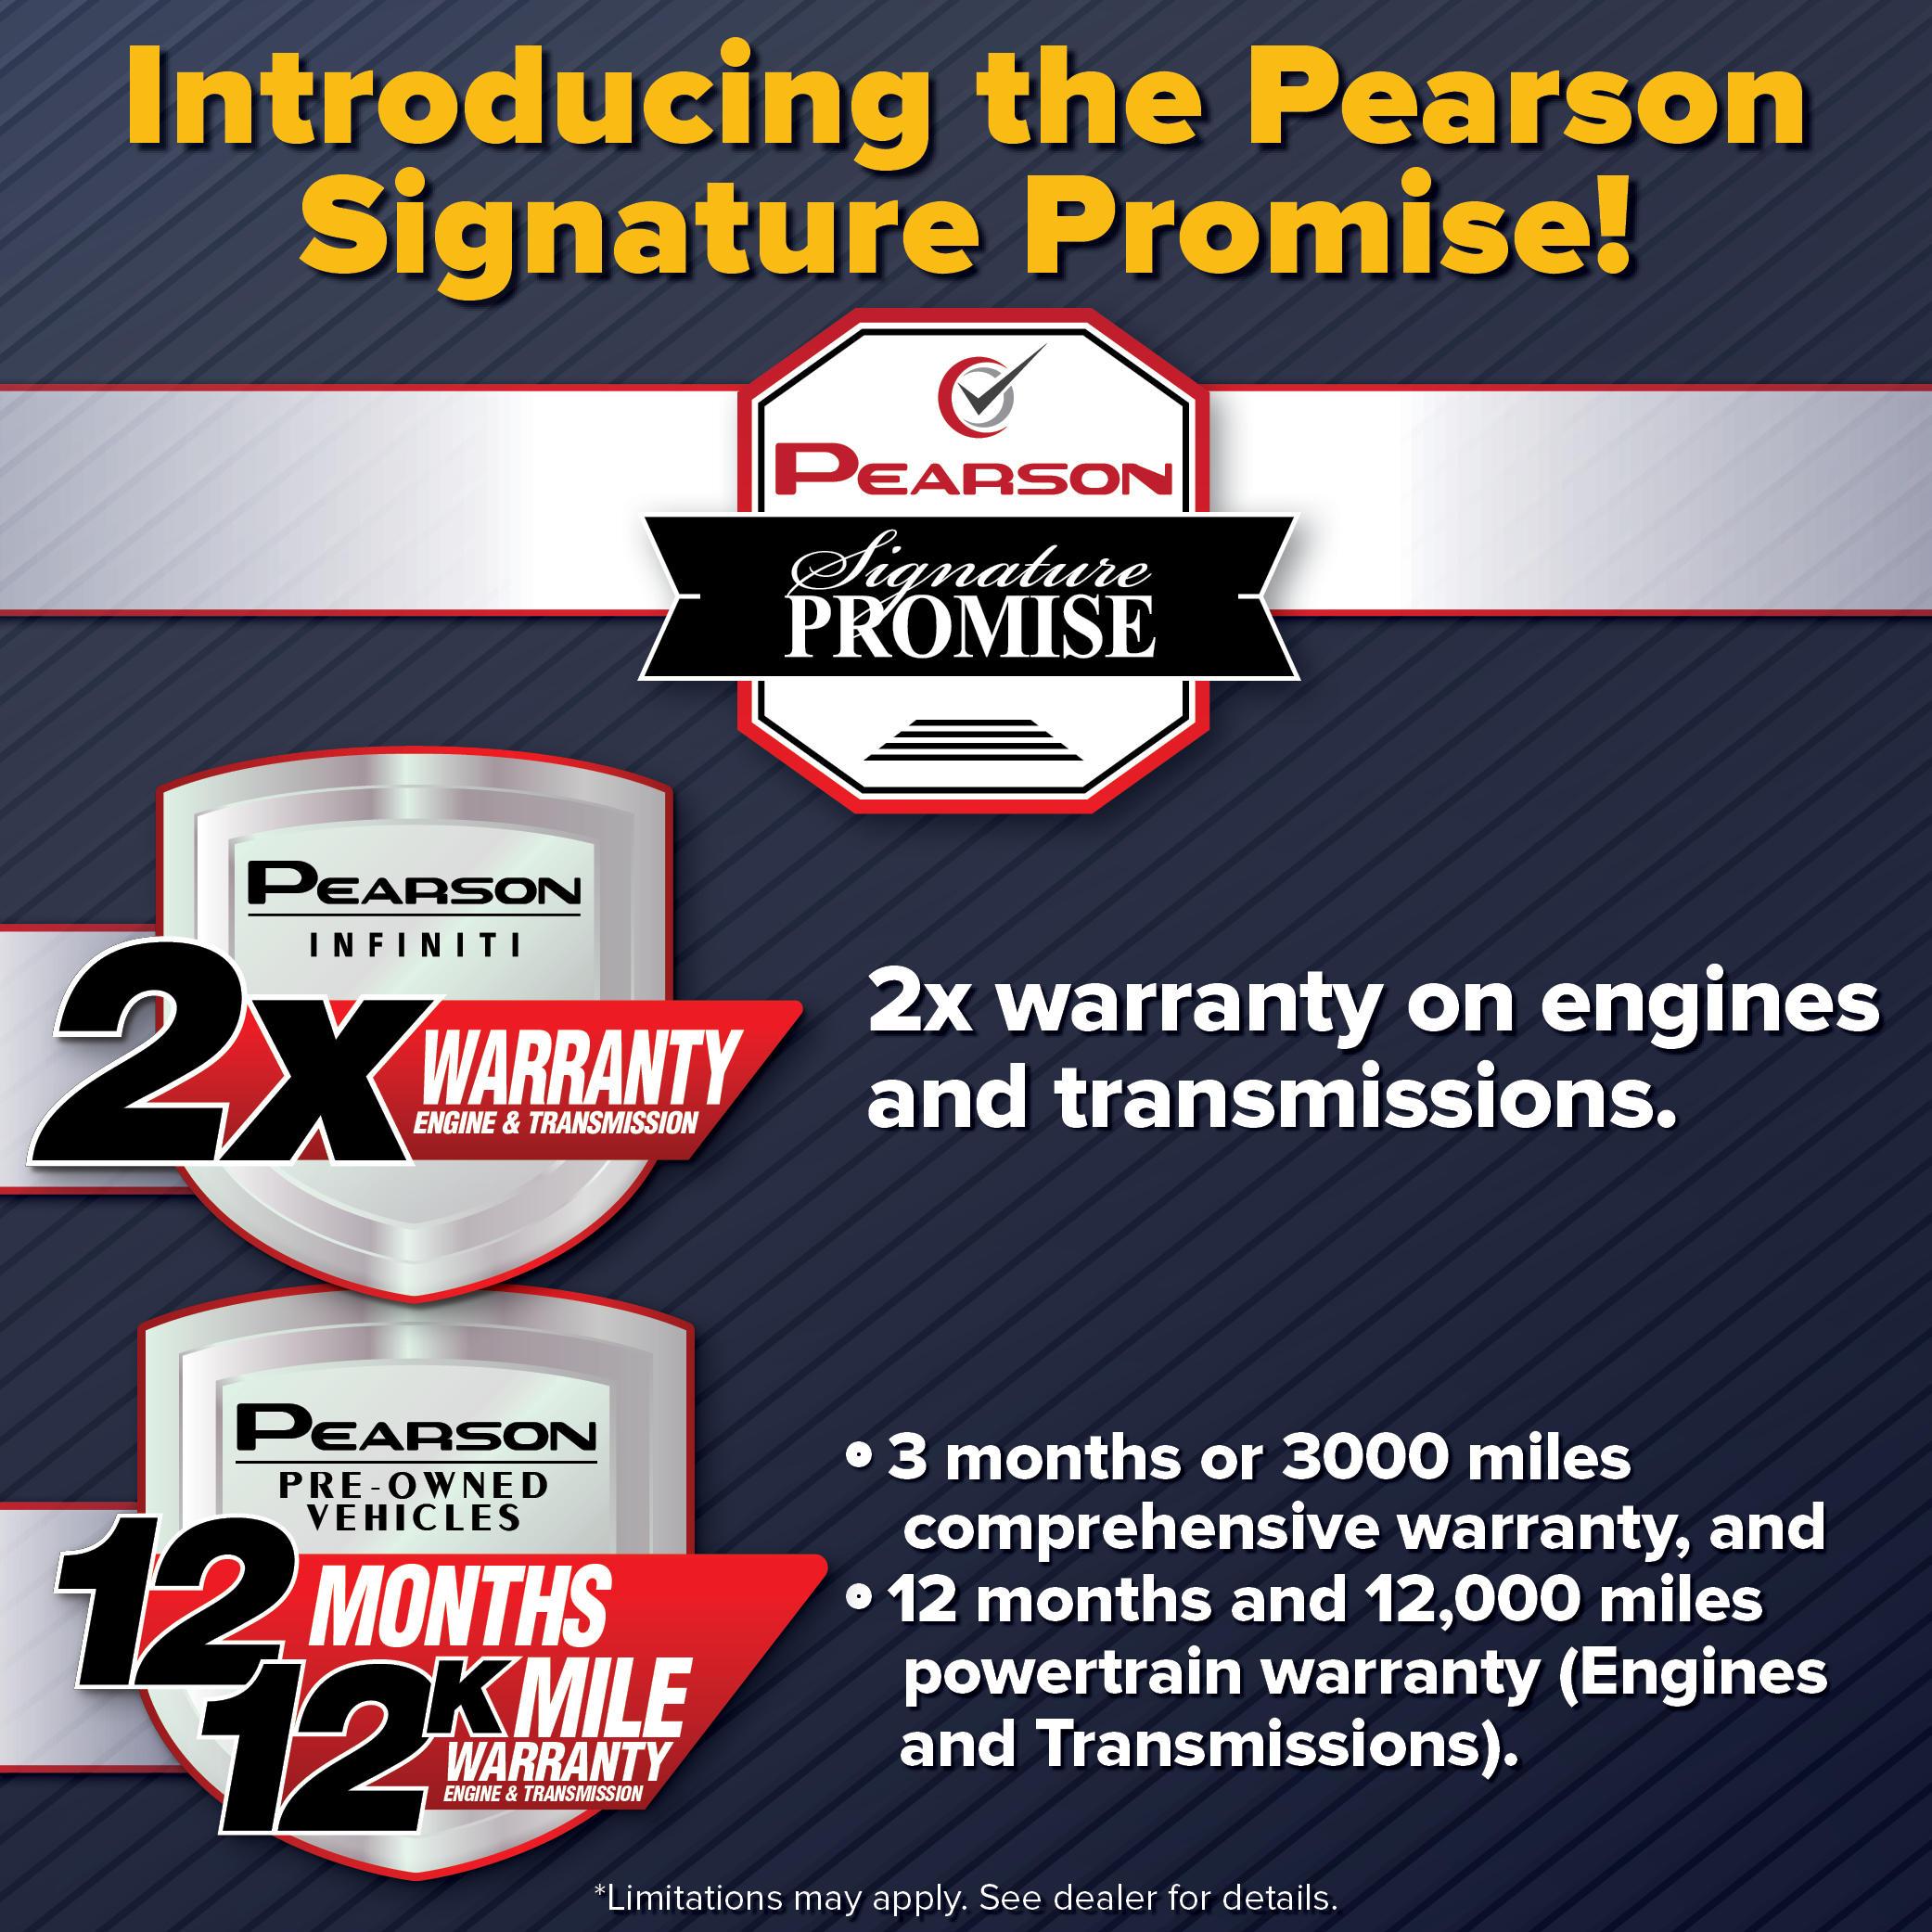 Pearson Promise